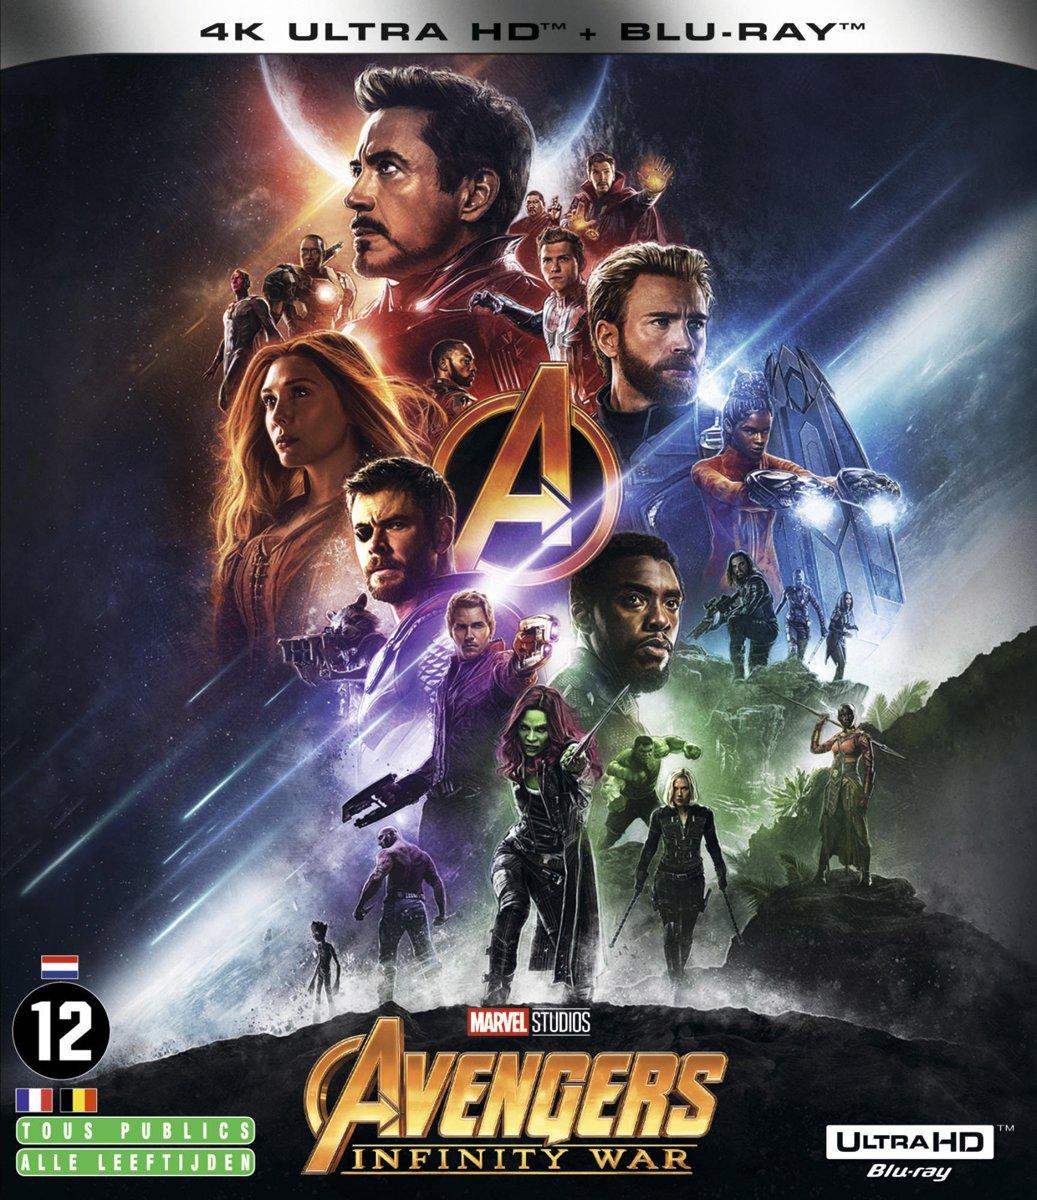 The Avengers: Infinity War 4K-